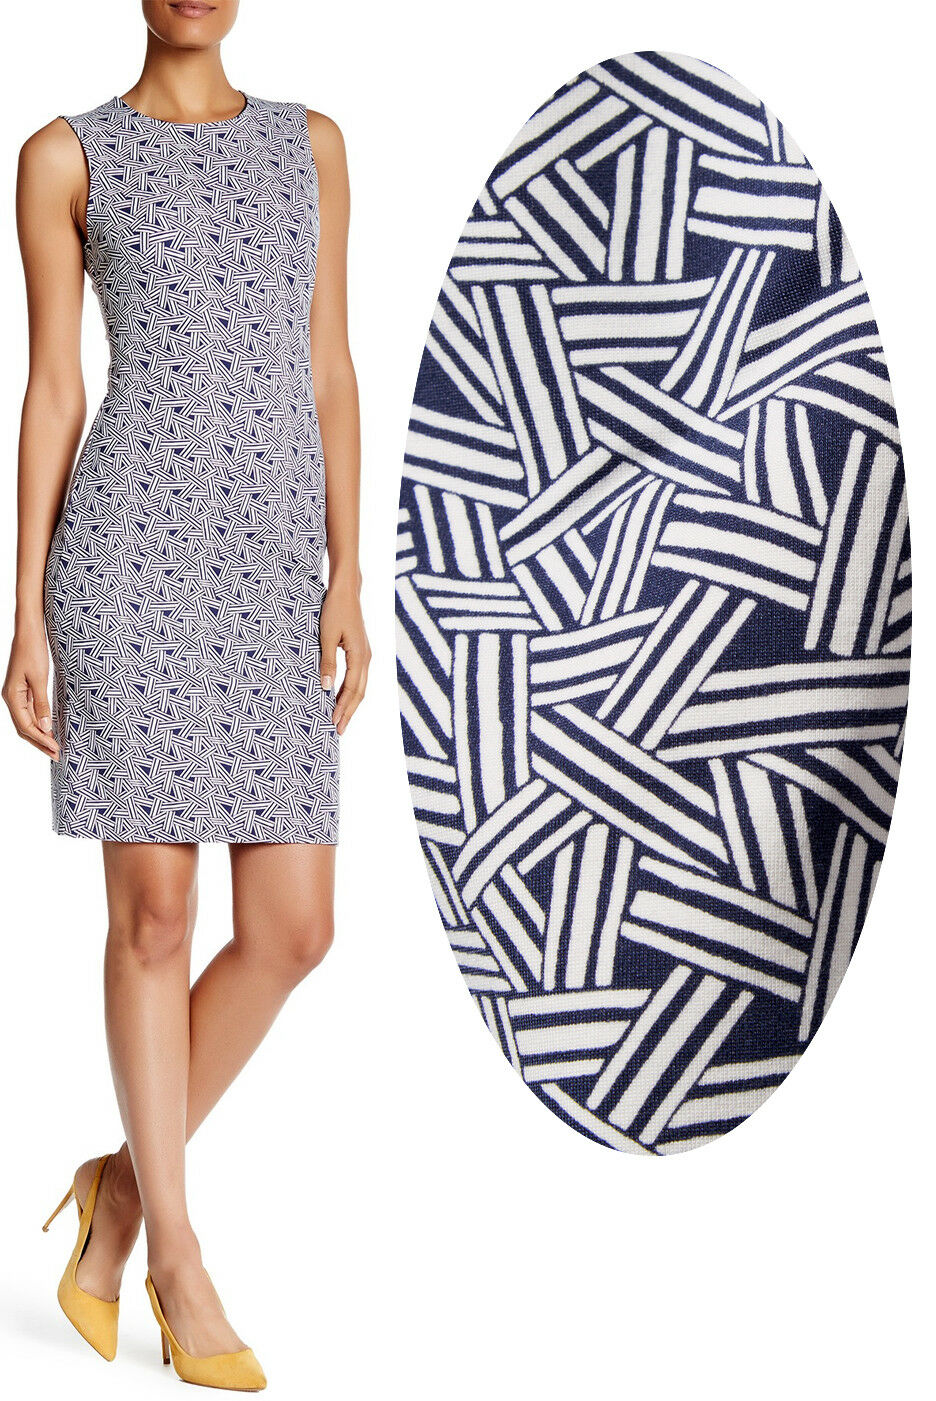 392dd7dc Diane Von Furstenberg DVF Regenna Ribbon Rectangles Stretch Sheath Dress 14